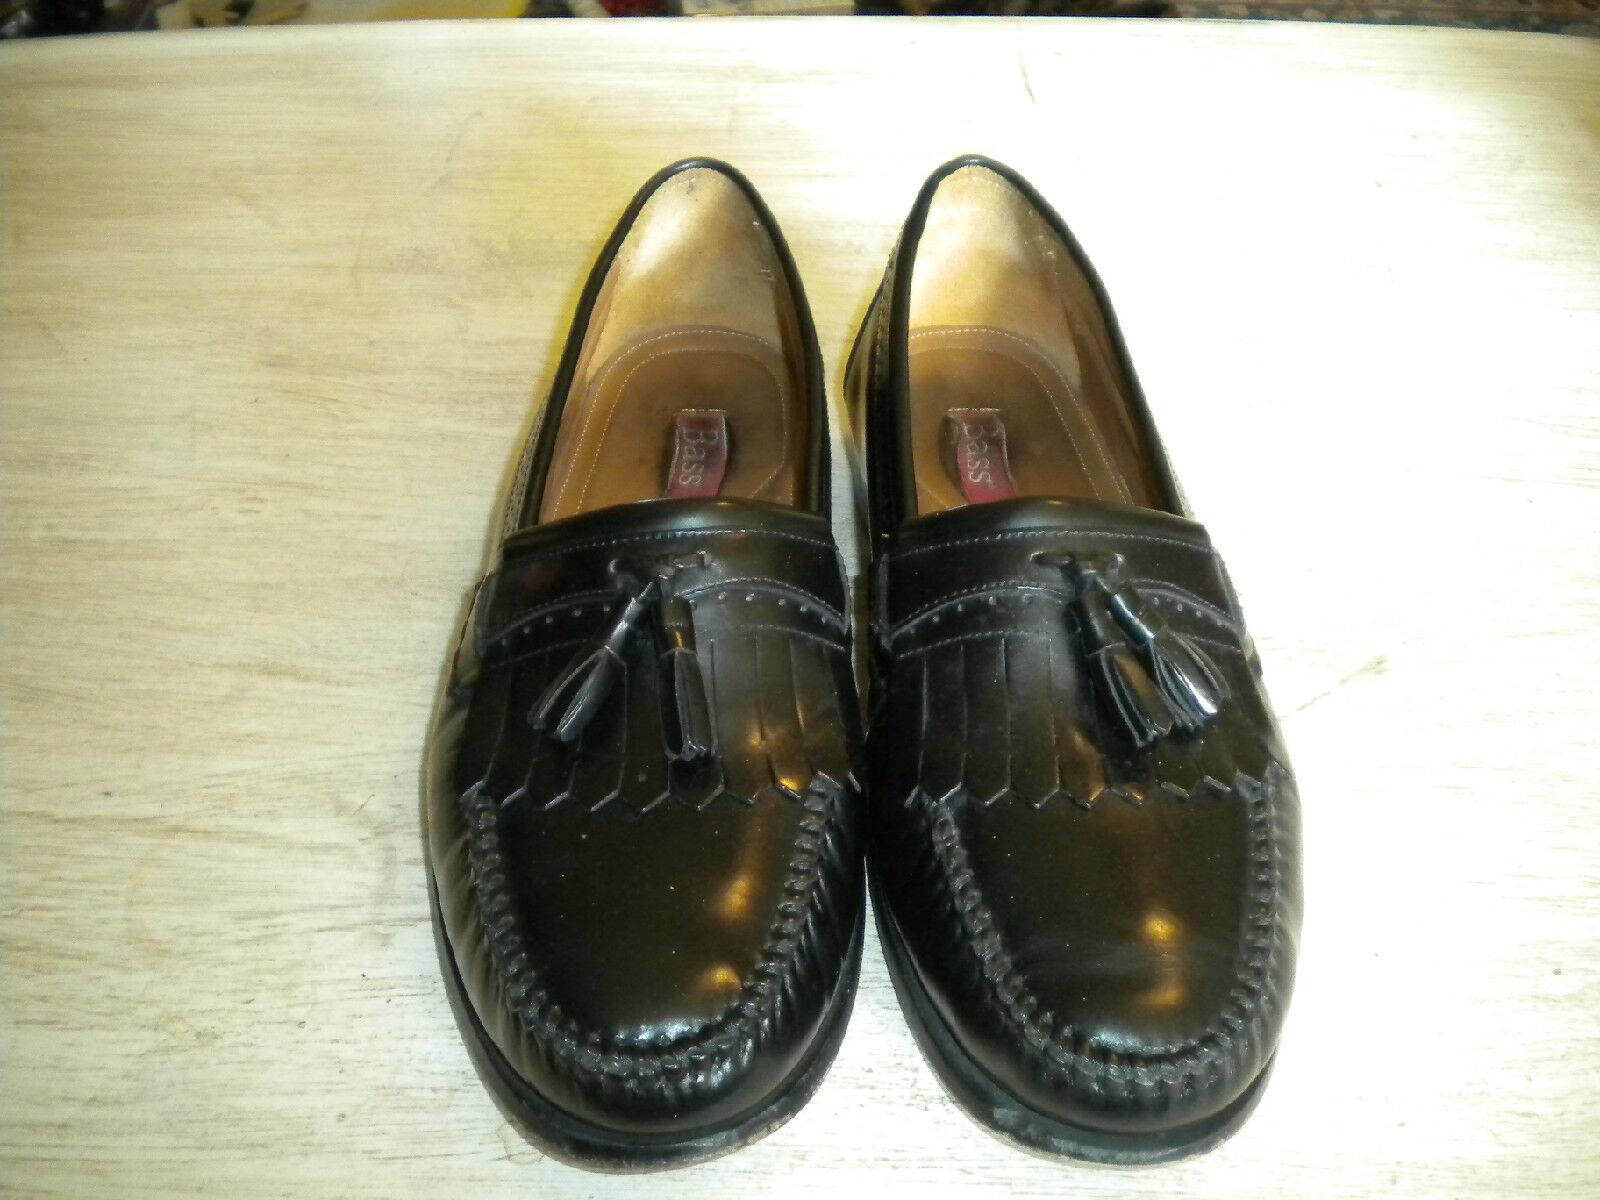 Mens Loafers Bass Black Kiltie Tassel Loafers Mens 12 D 4ed047